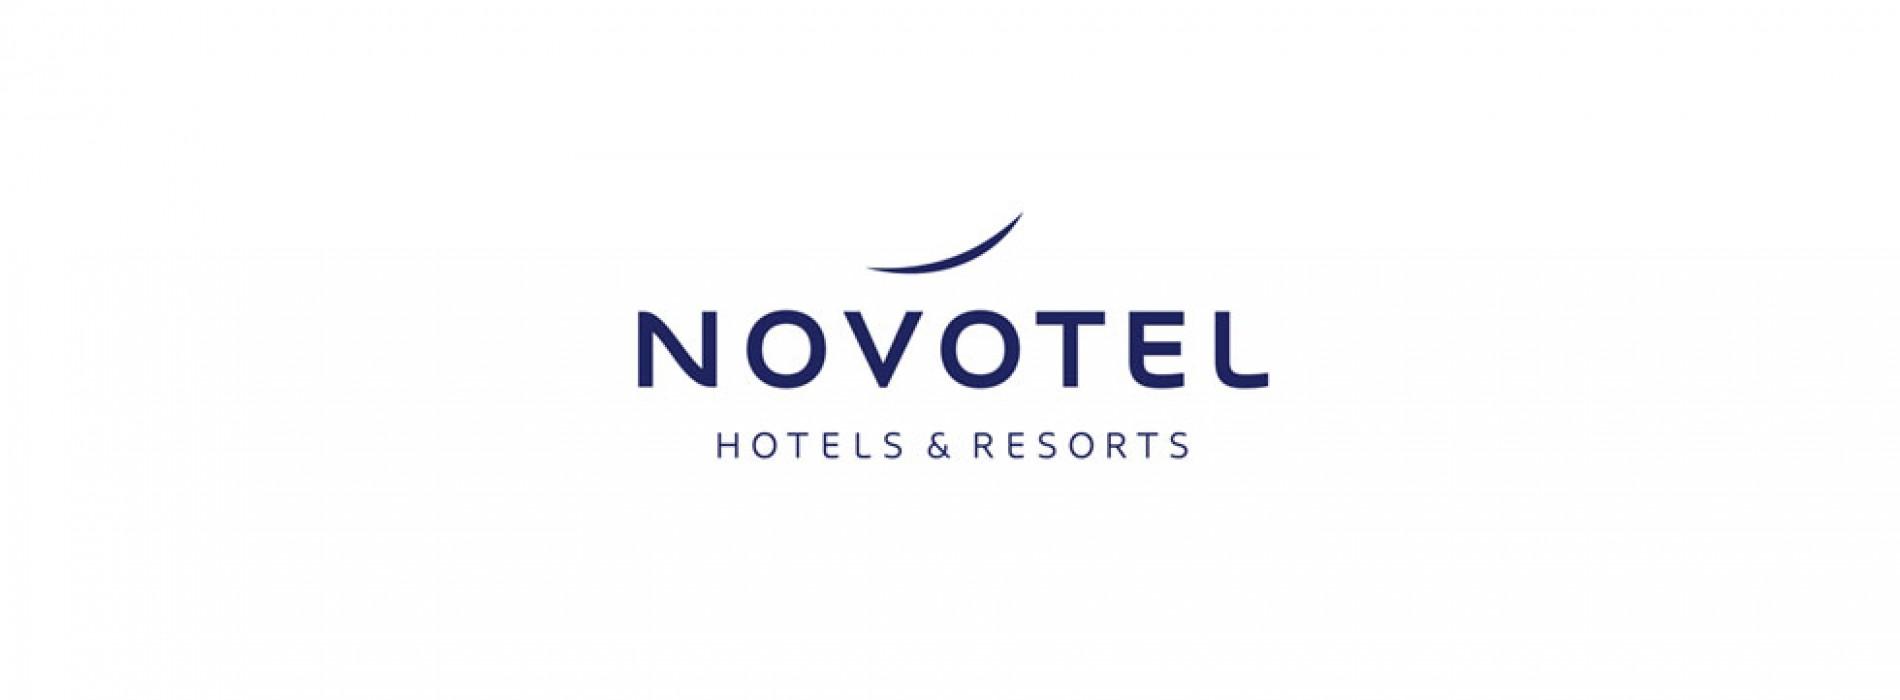 Novotel Visakhapatnam hosts the International Fleet Review 2016